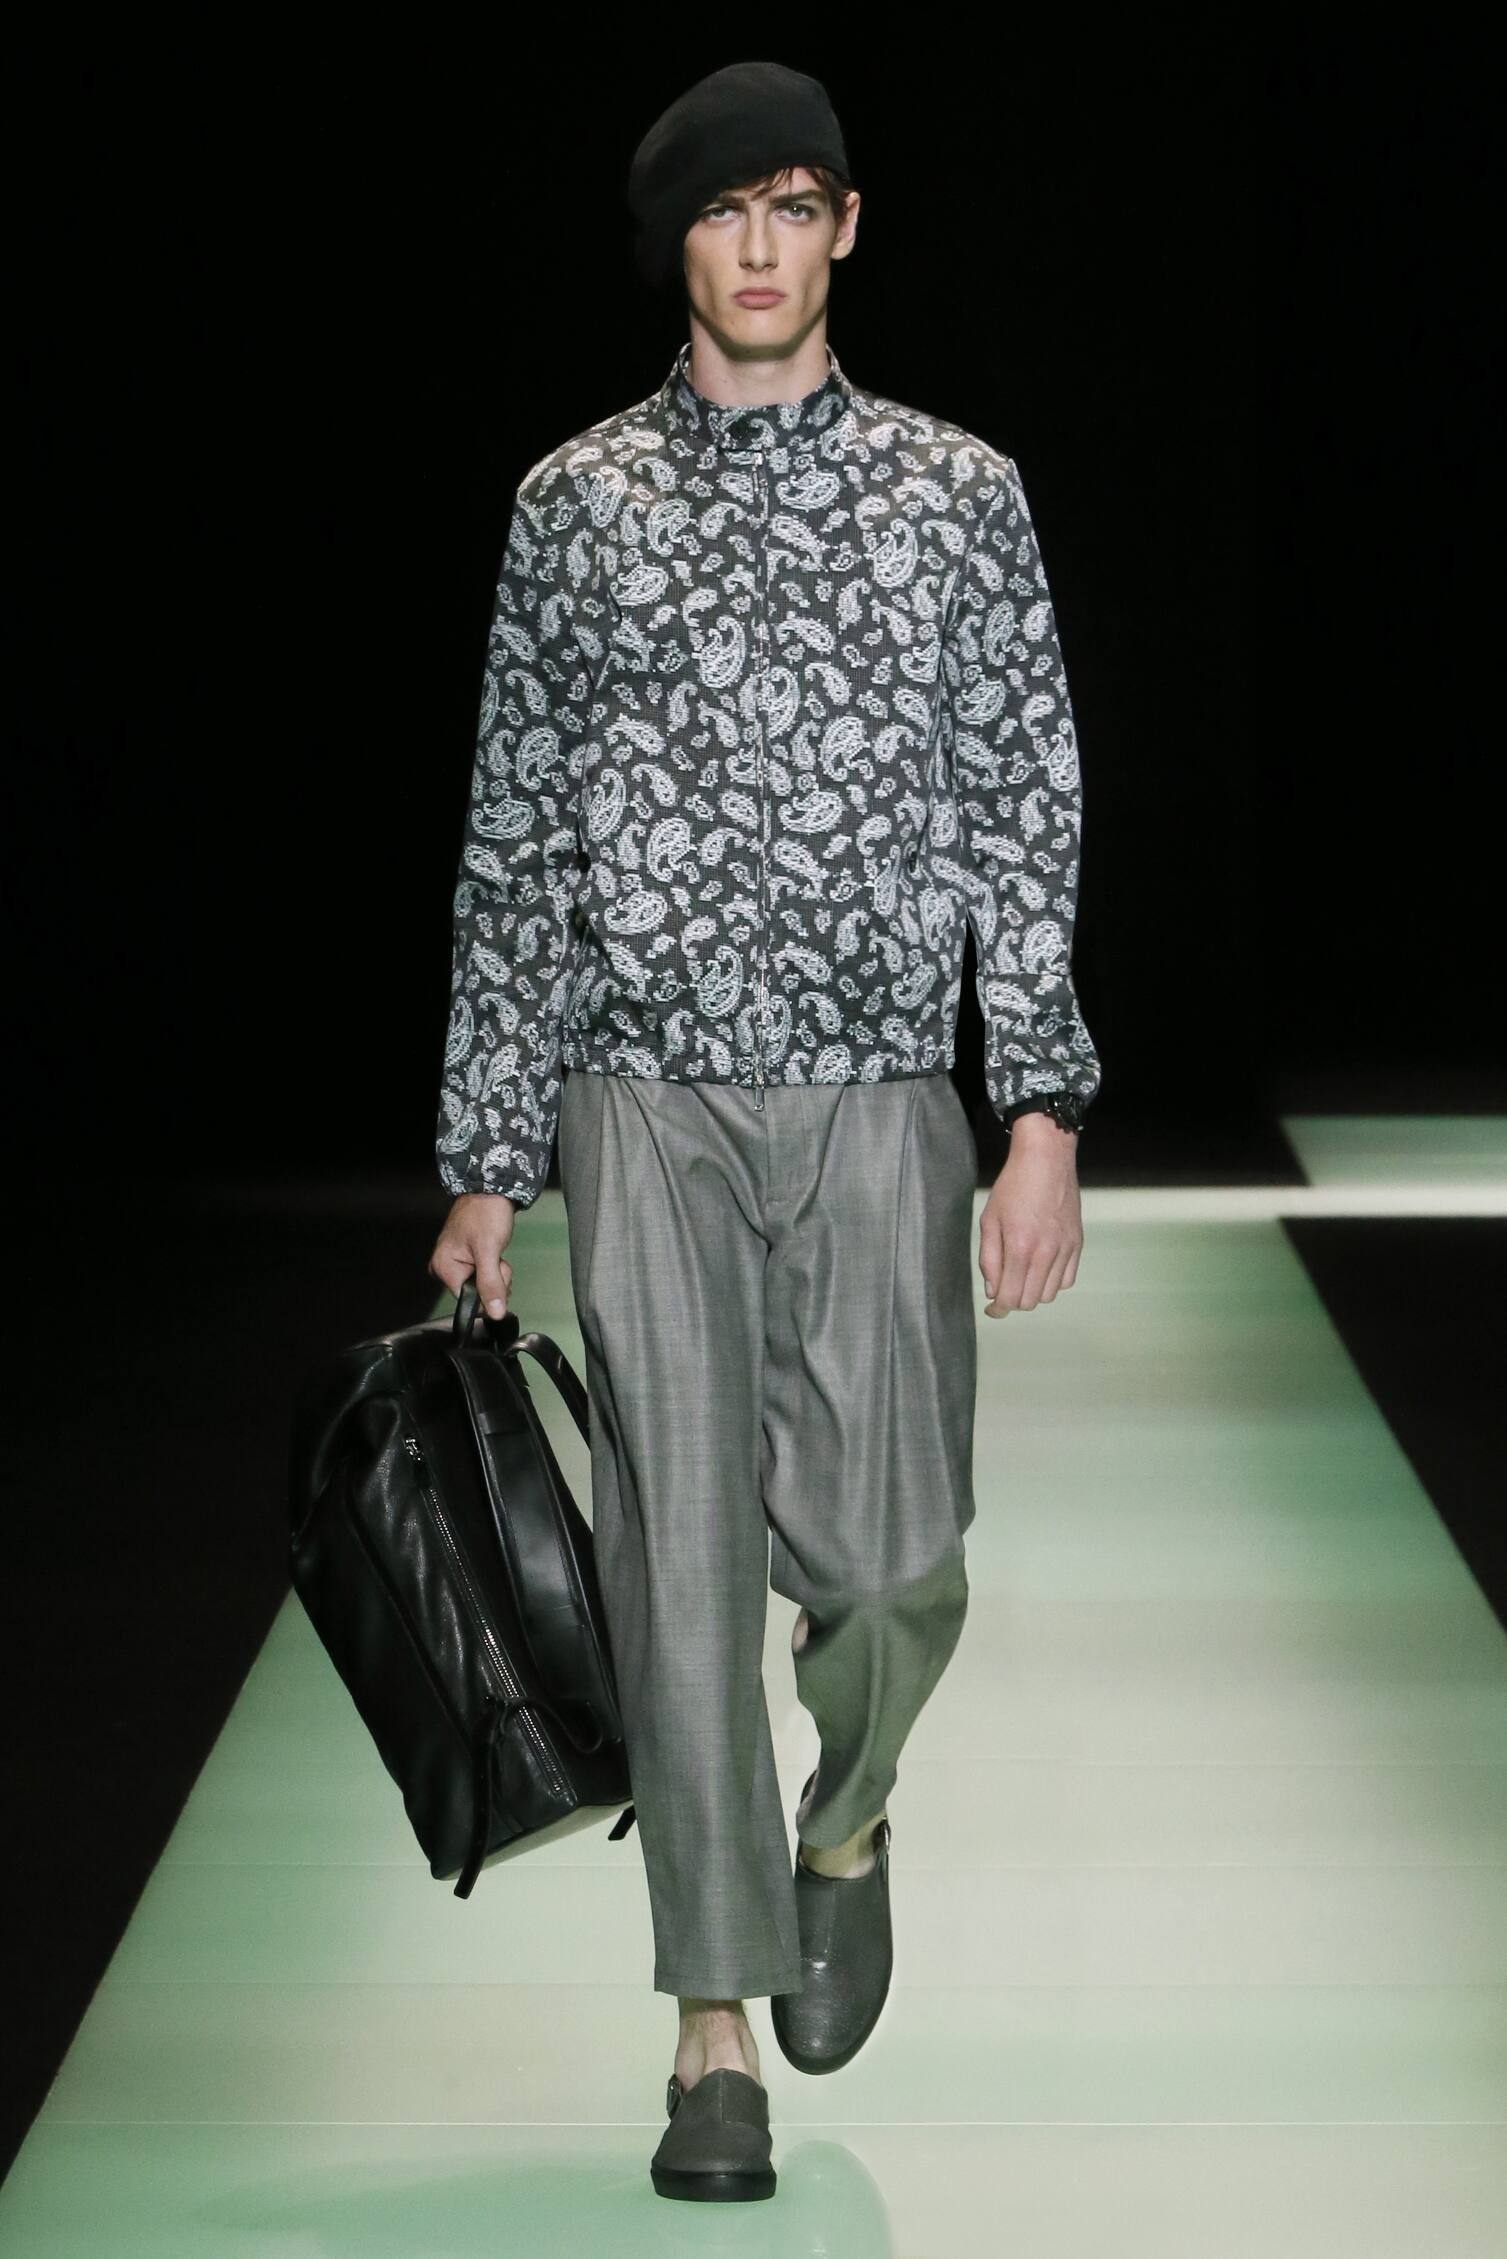 Fashion Show SS 2016 Emporio Armani Menswear